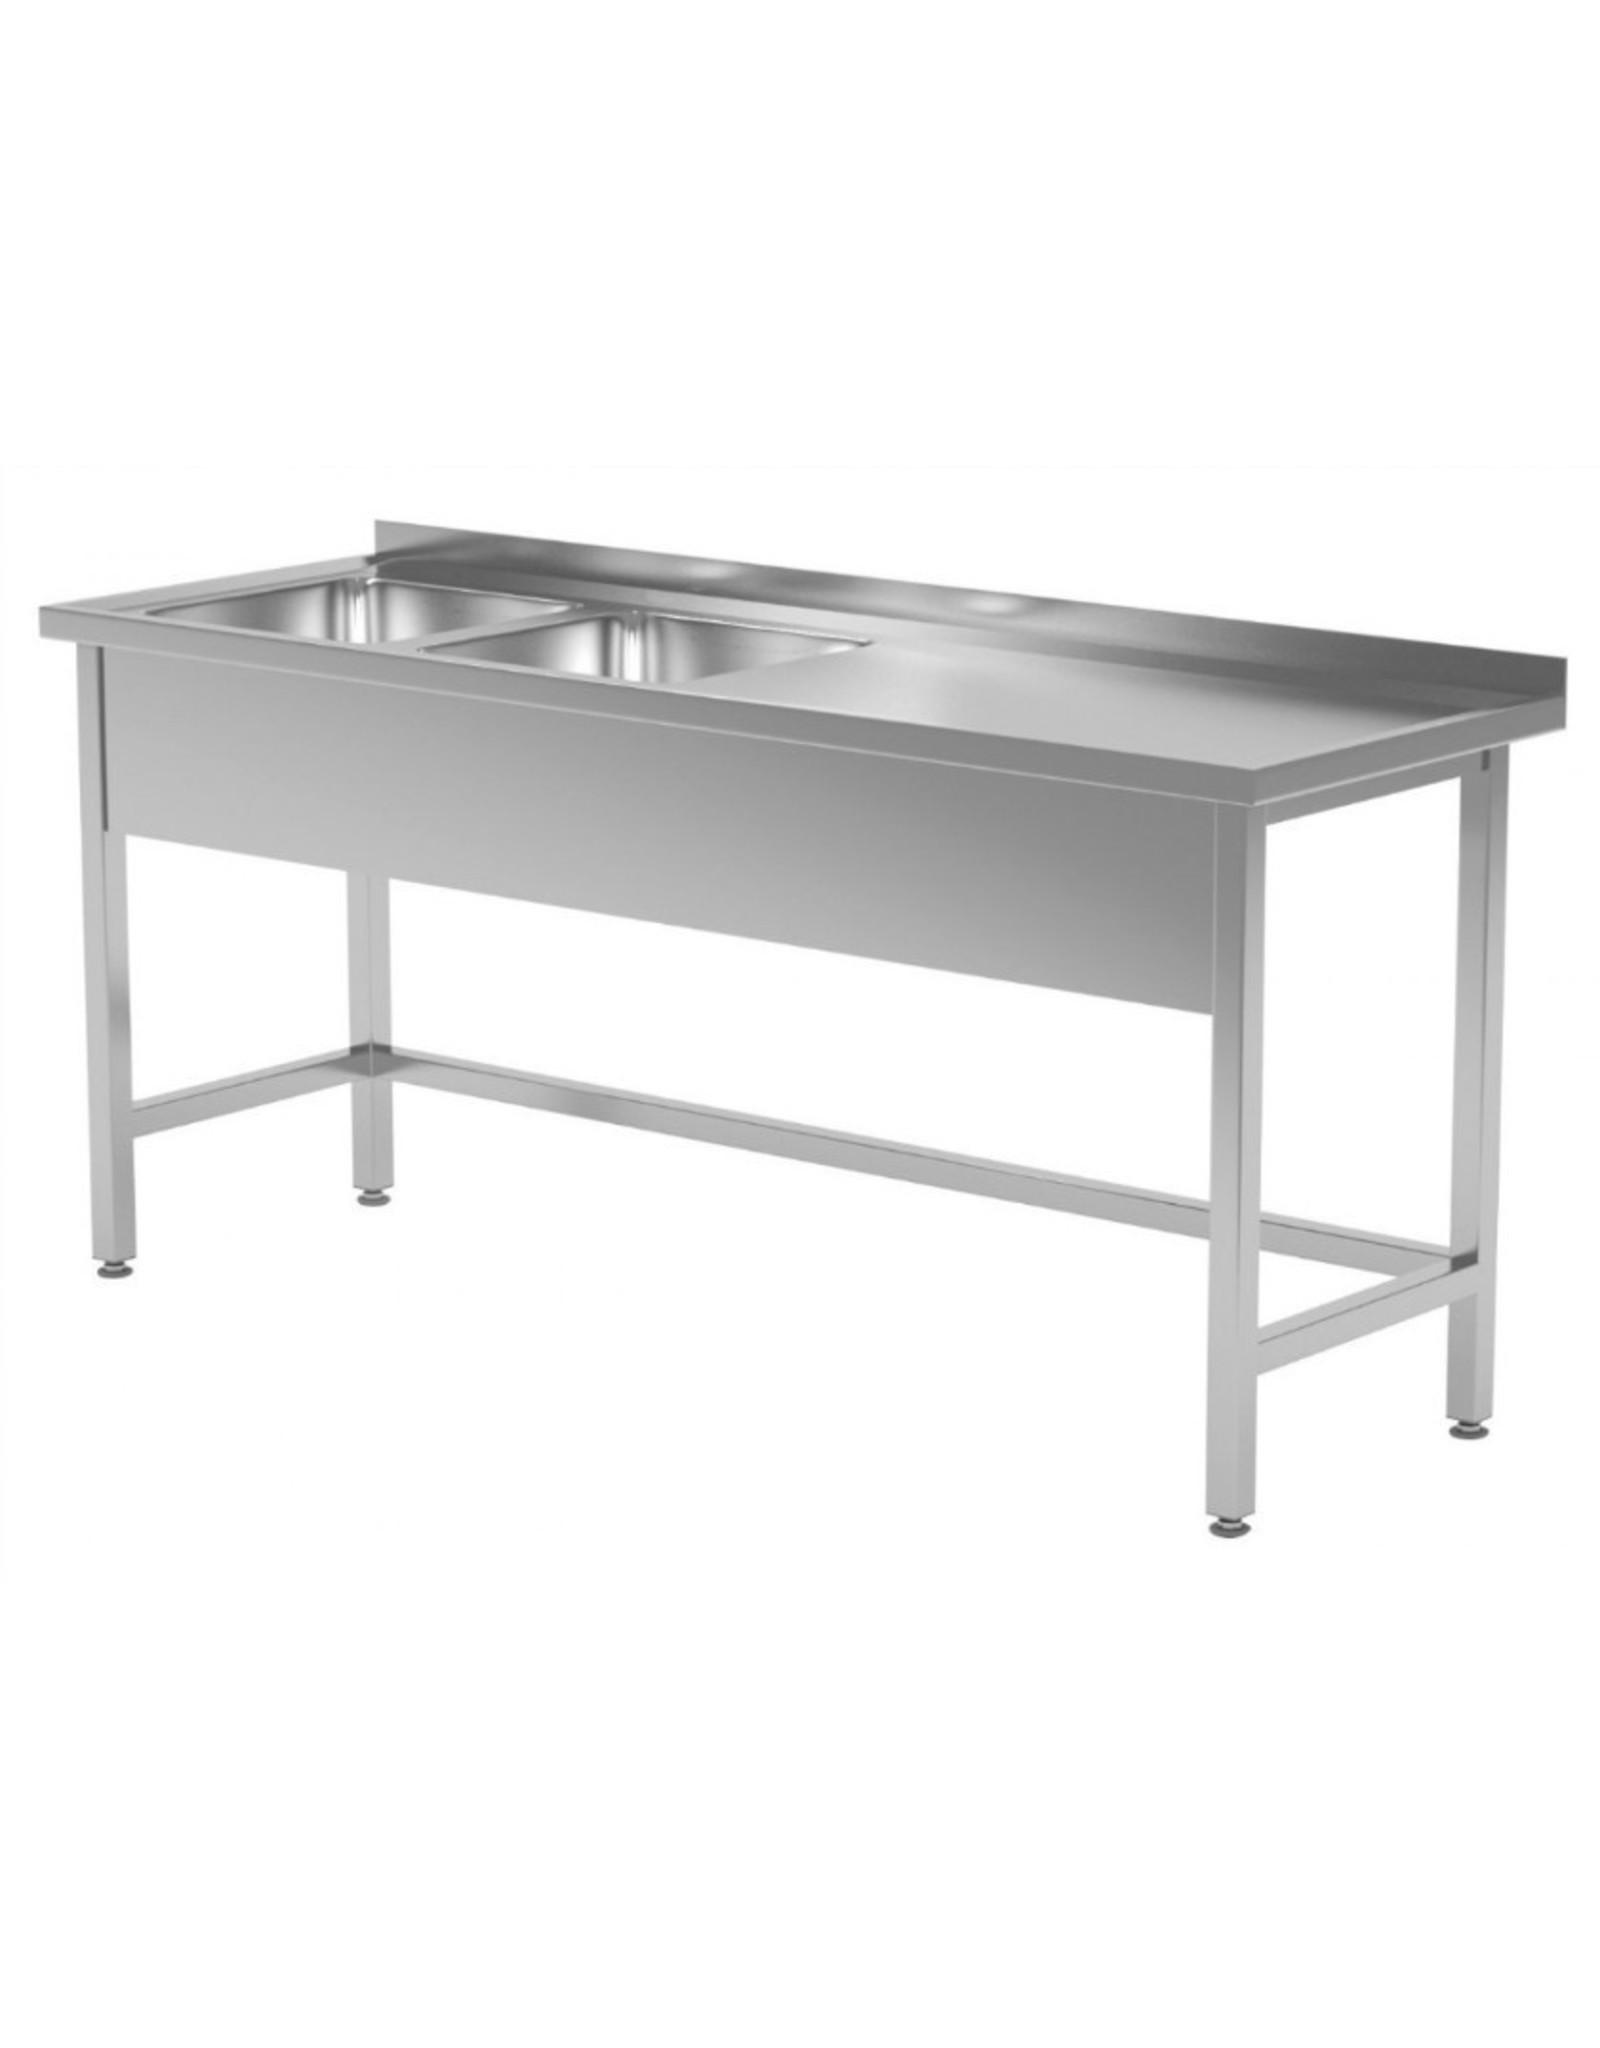 Spoeltafel met open onderkant verstevigd | 2 spoelbakken links | 1400-1900mm breed | 600 of 700mm diep